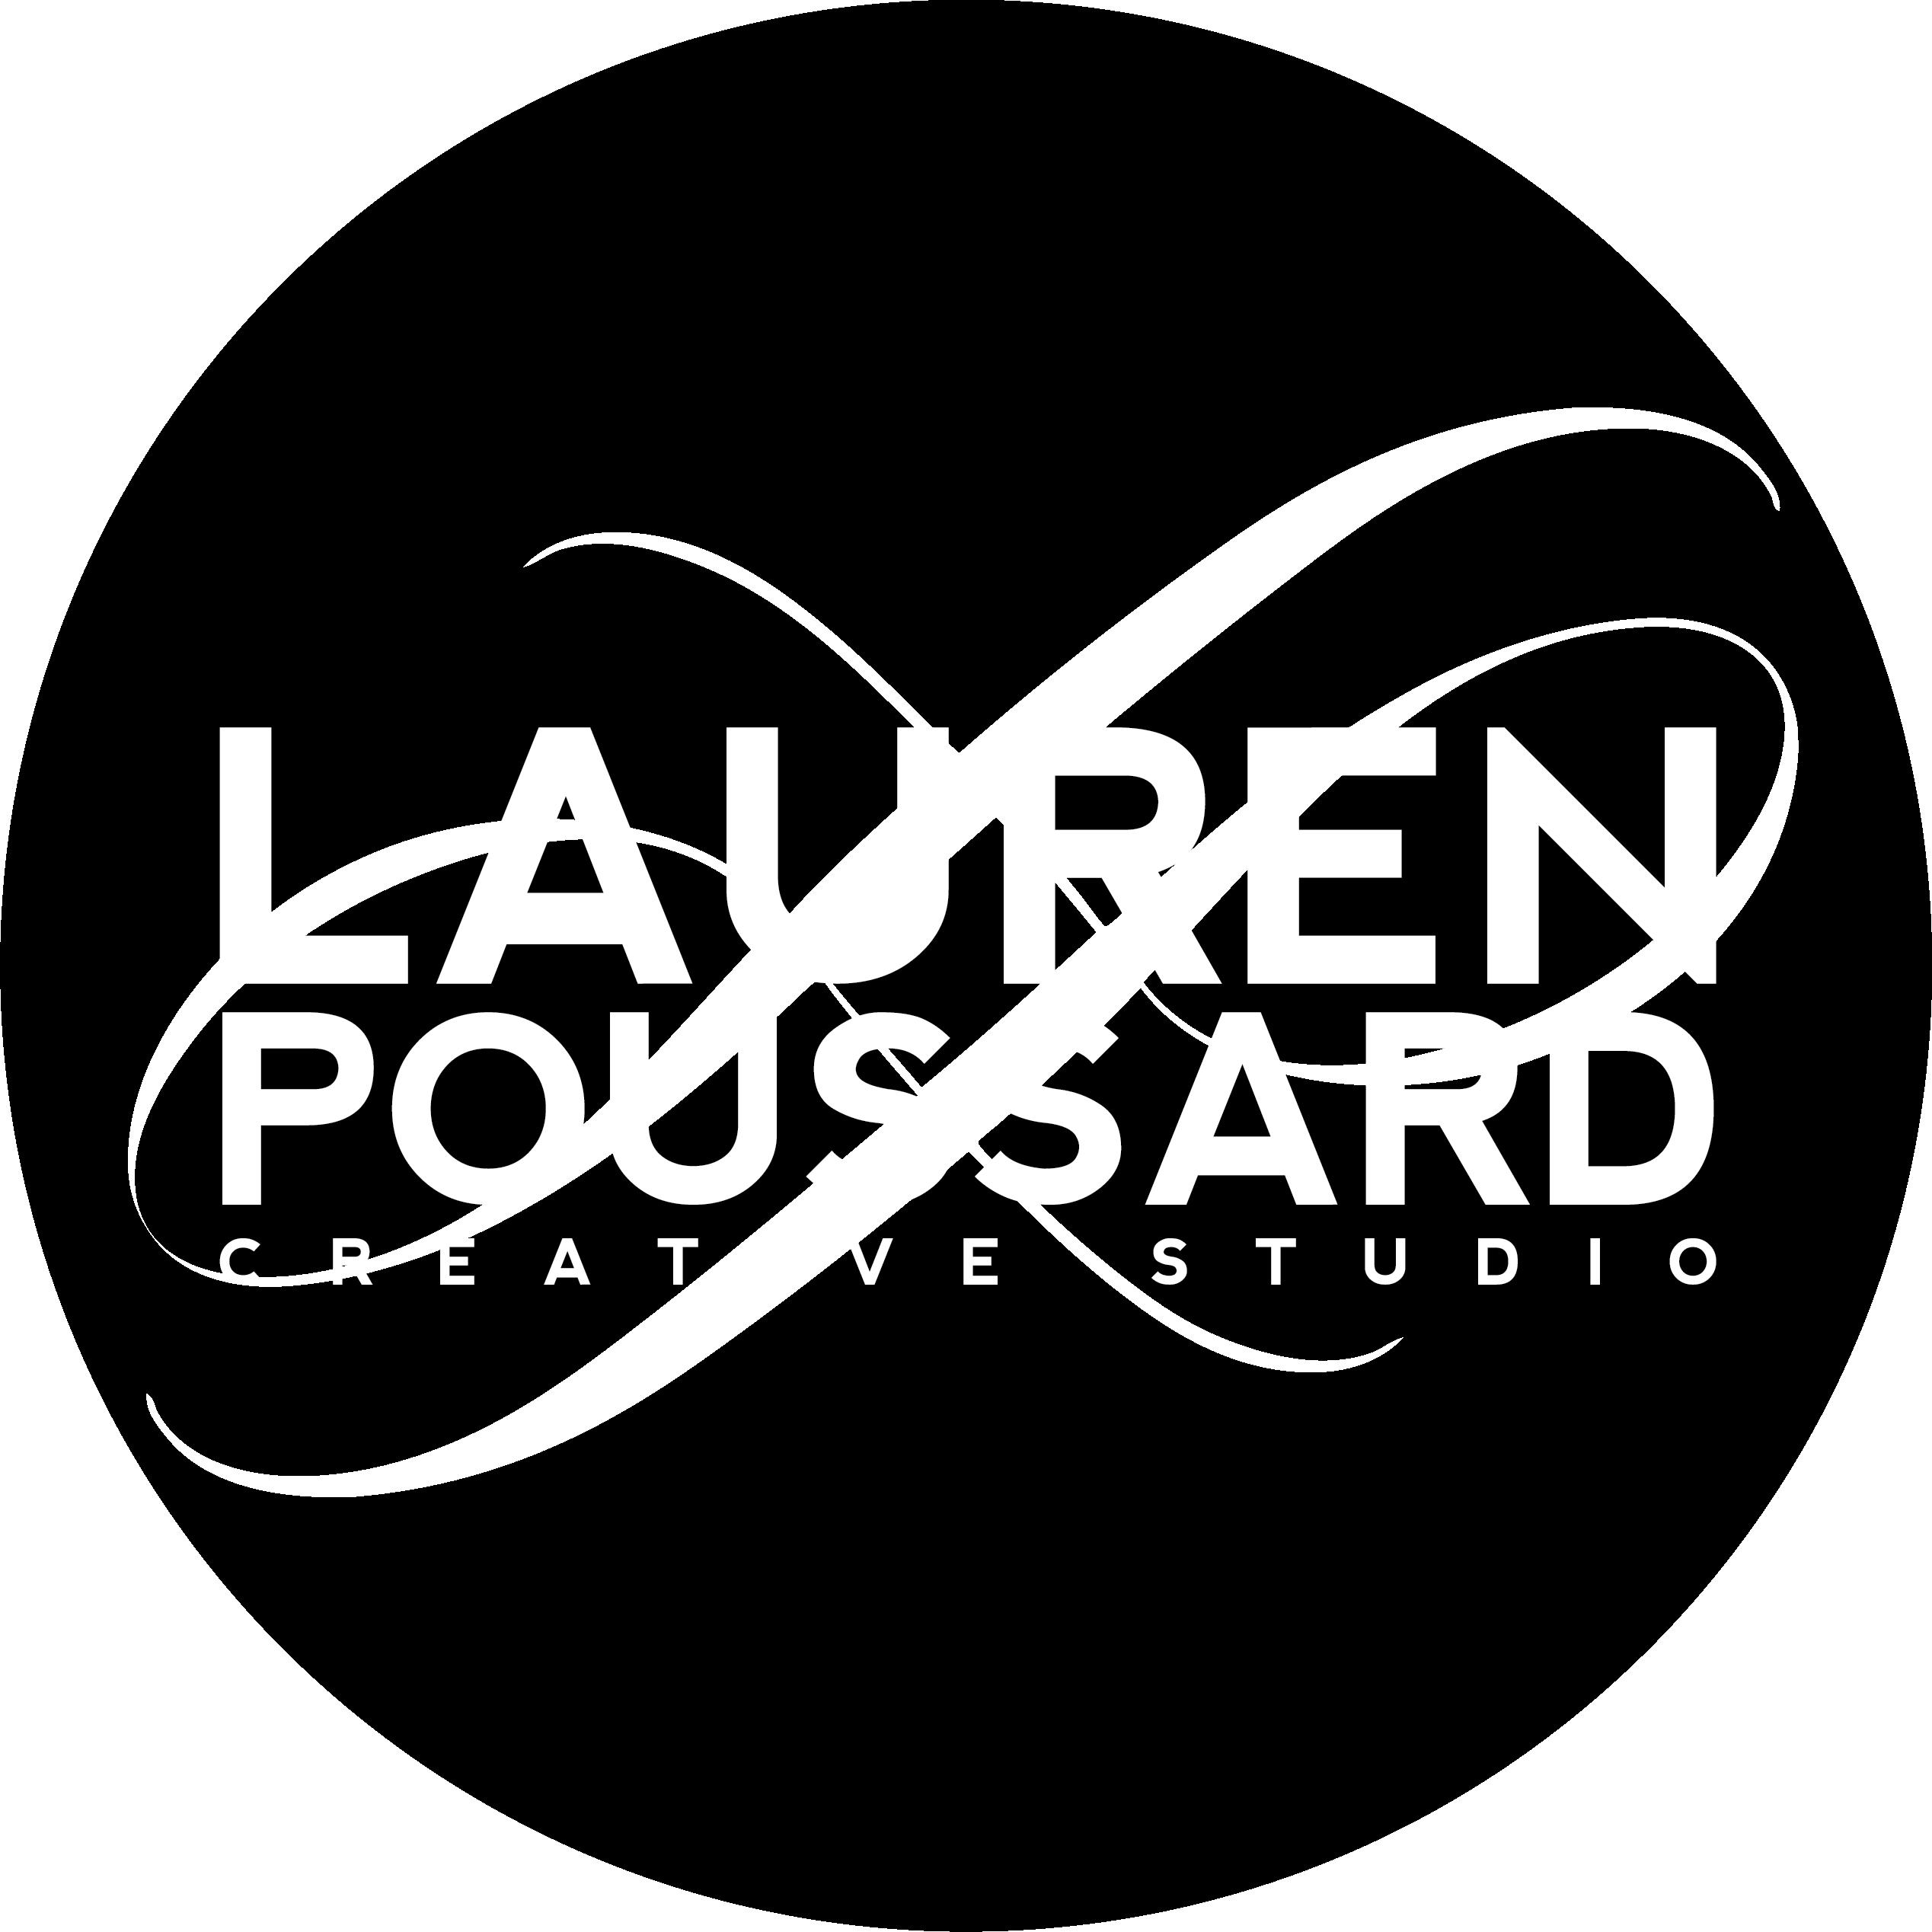 lauren poussard | creative studio